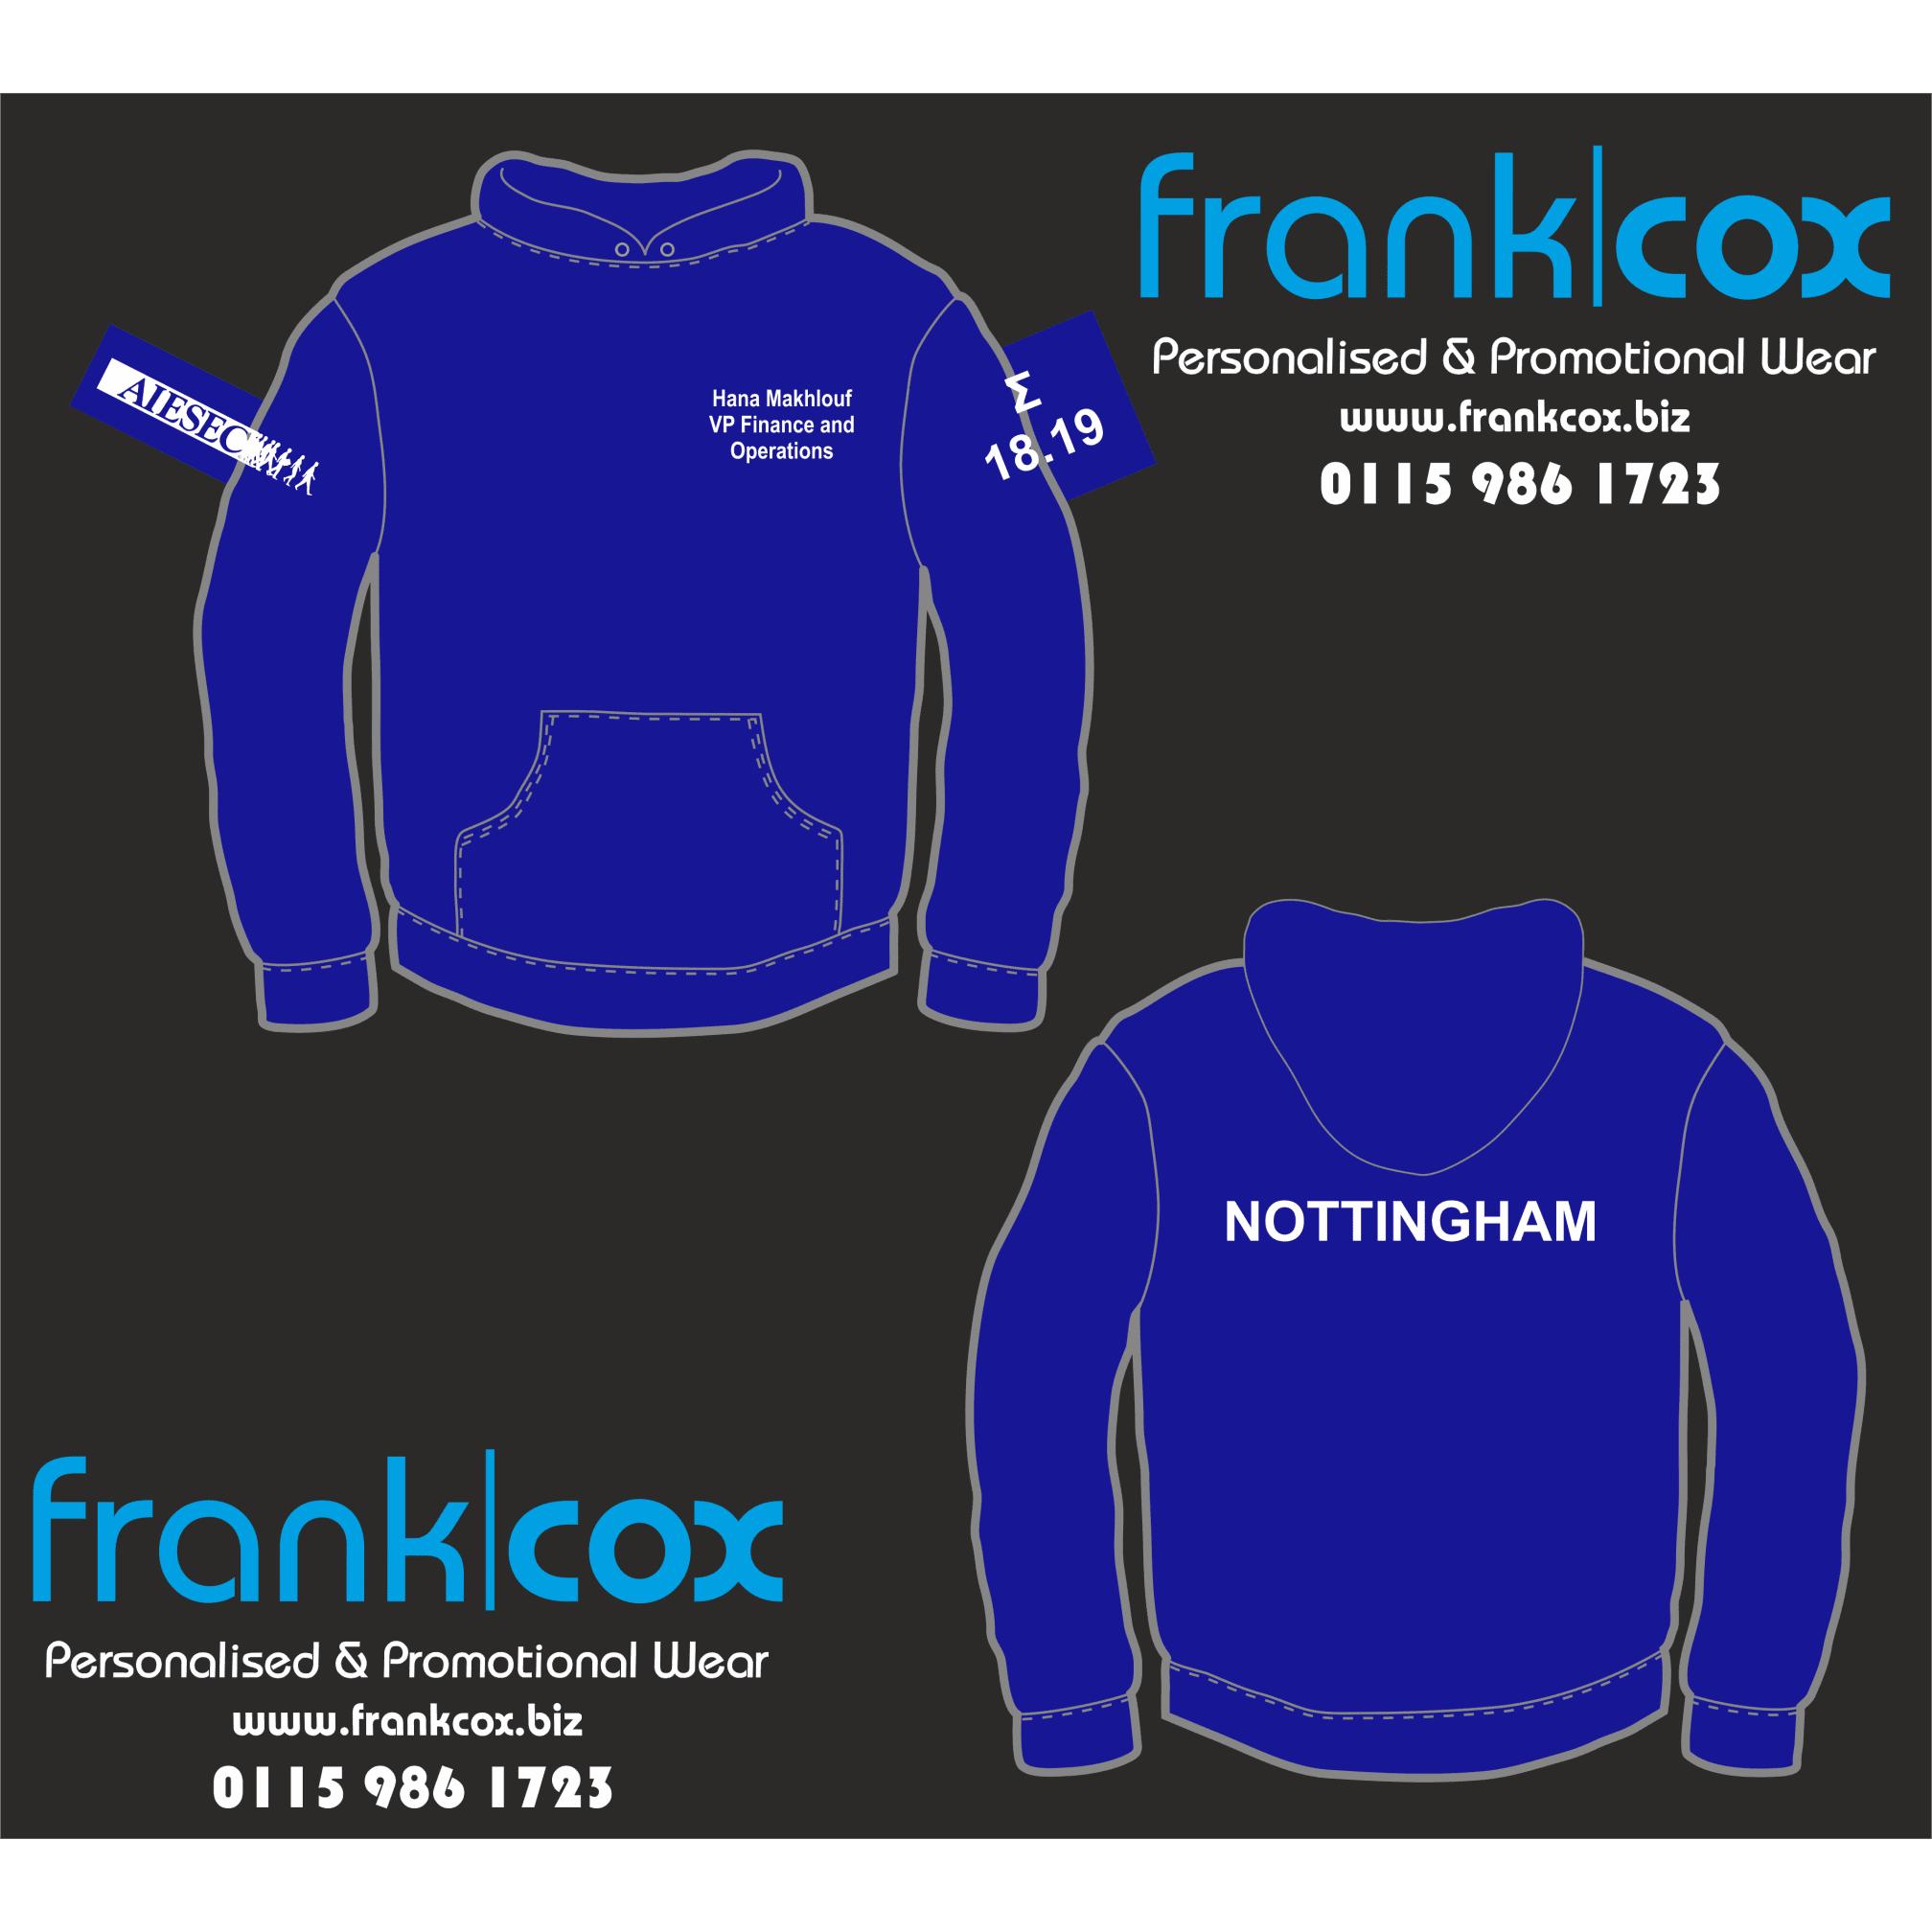 Frank Cox Personalised & Promotional Wear - Nottingham, Nottinghamshire NG7 7JP - 01159 861723 | ShowMeLocal.com